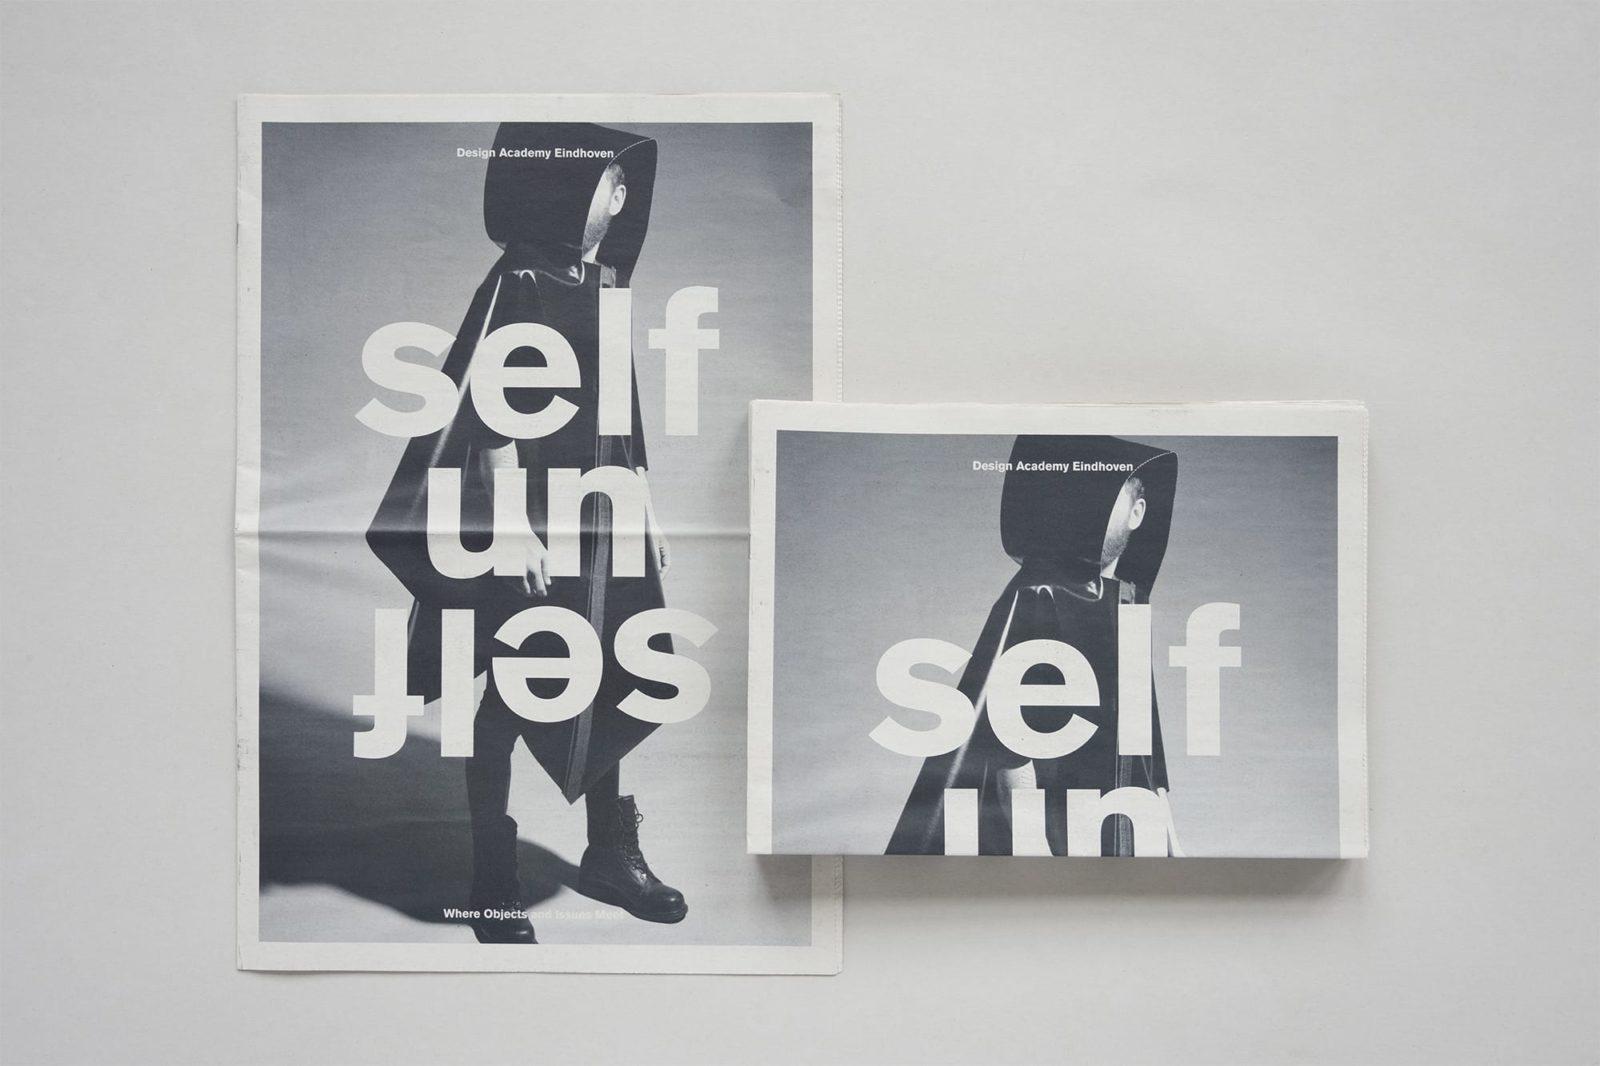 Haller Brun Design Academy Eindhoven Salone del Mobile Milano 2013 Self Unself visual identity newspaper banner